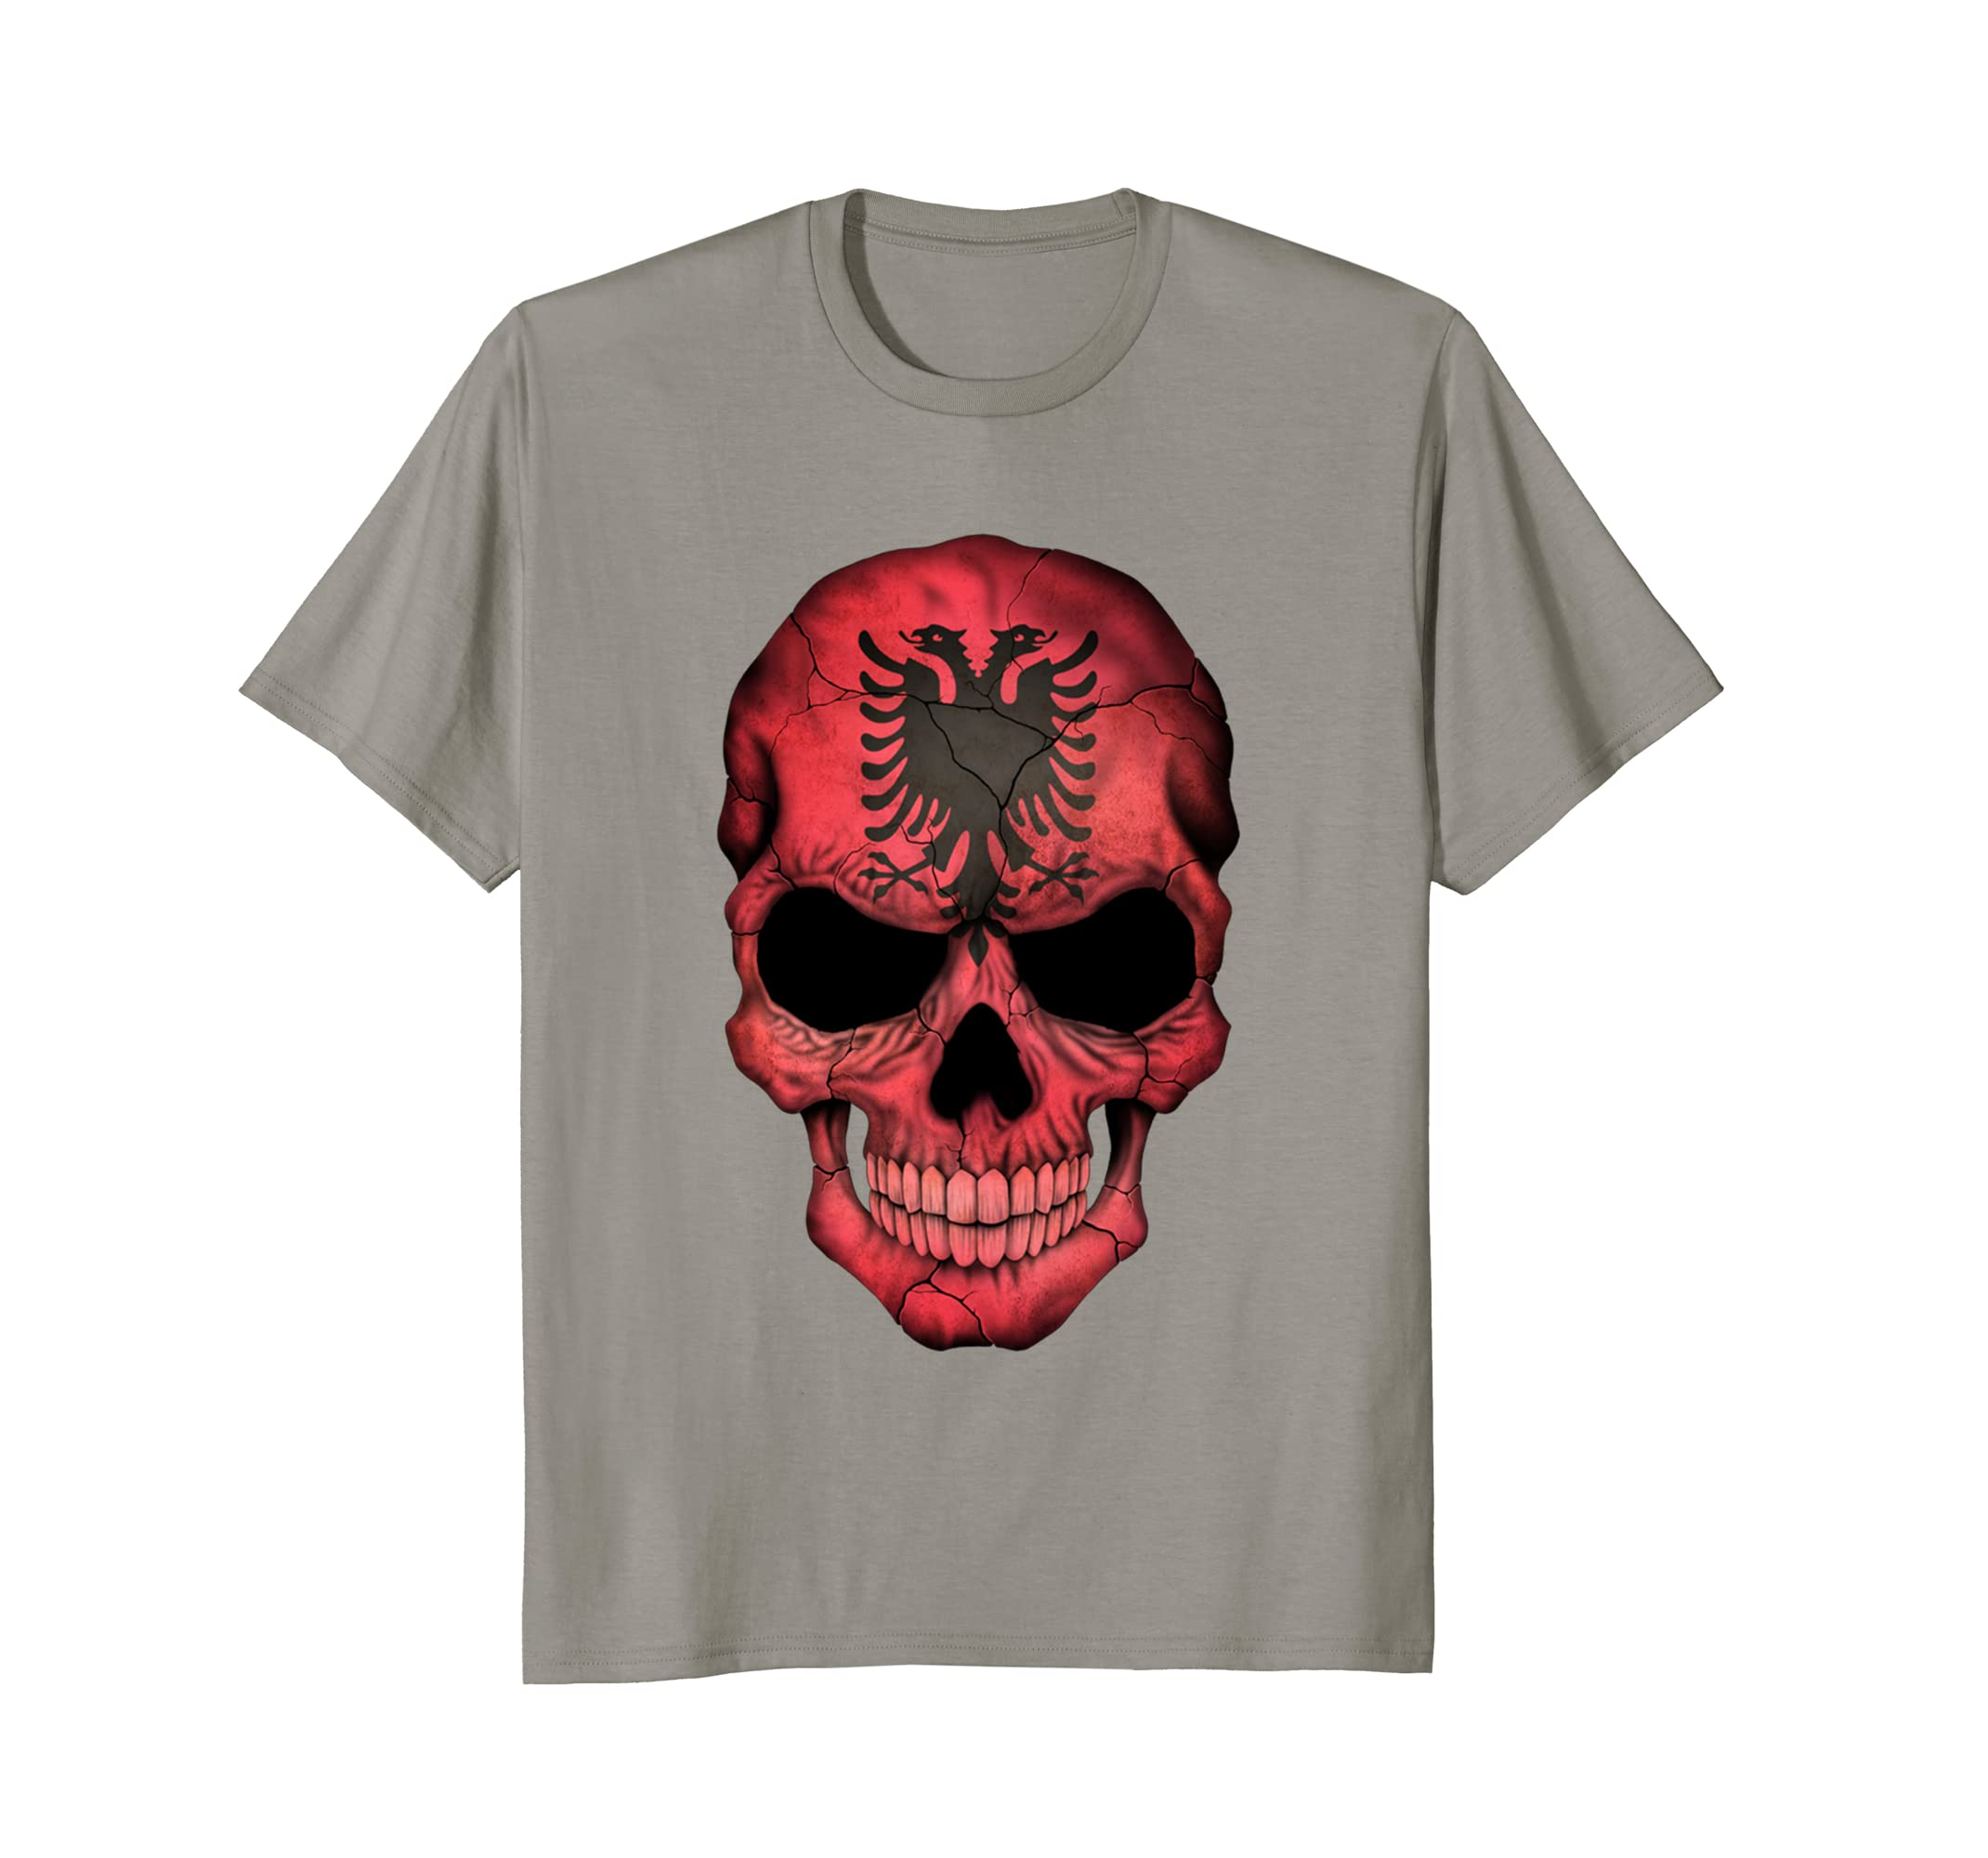 ba981d7b Fearless Skeleton Skull Head Red Bandana Face Mask T-Shirt Long ...